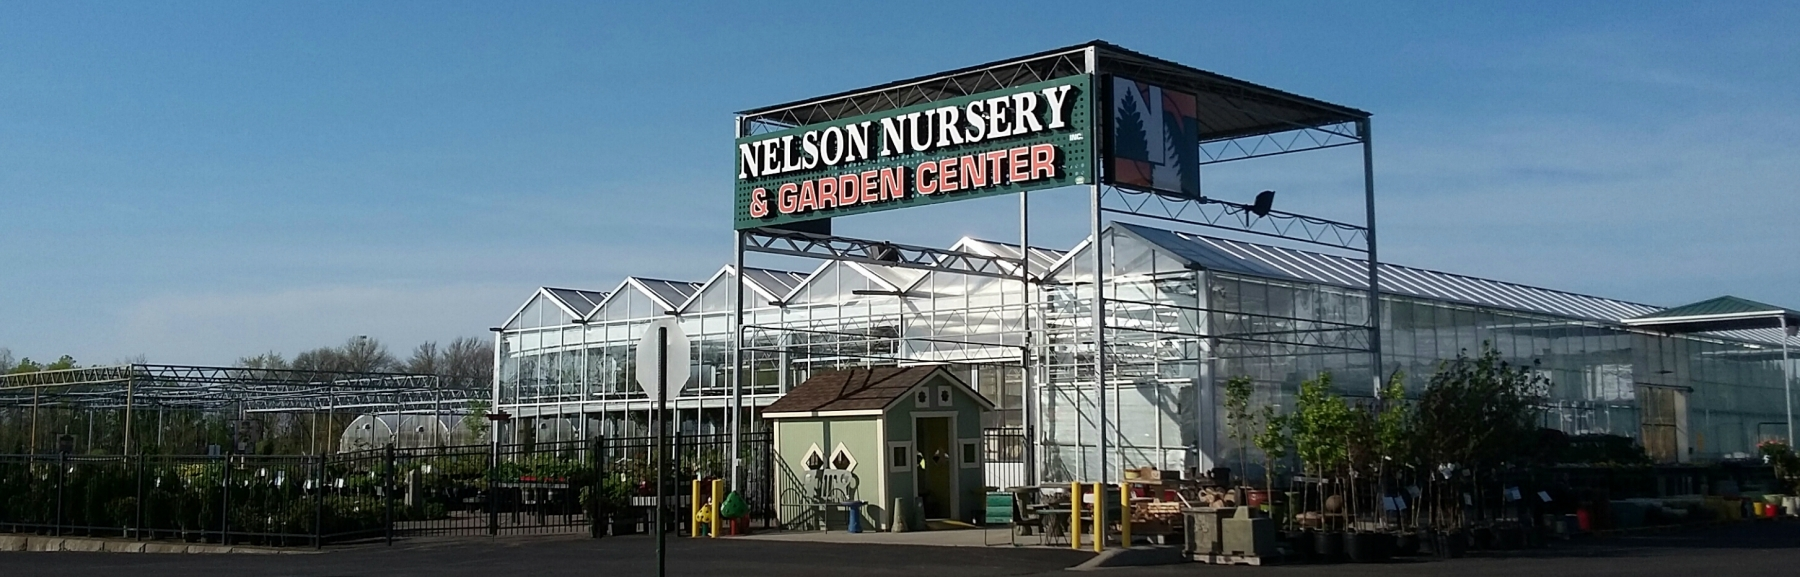 NelsonNurseryBuilding2018